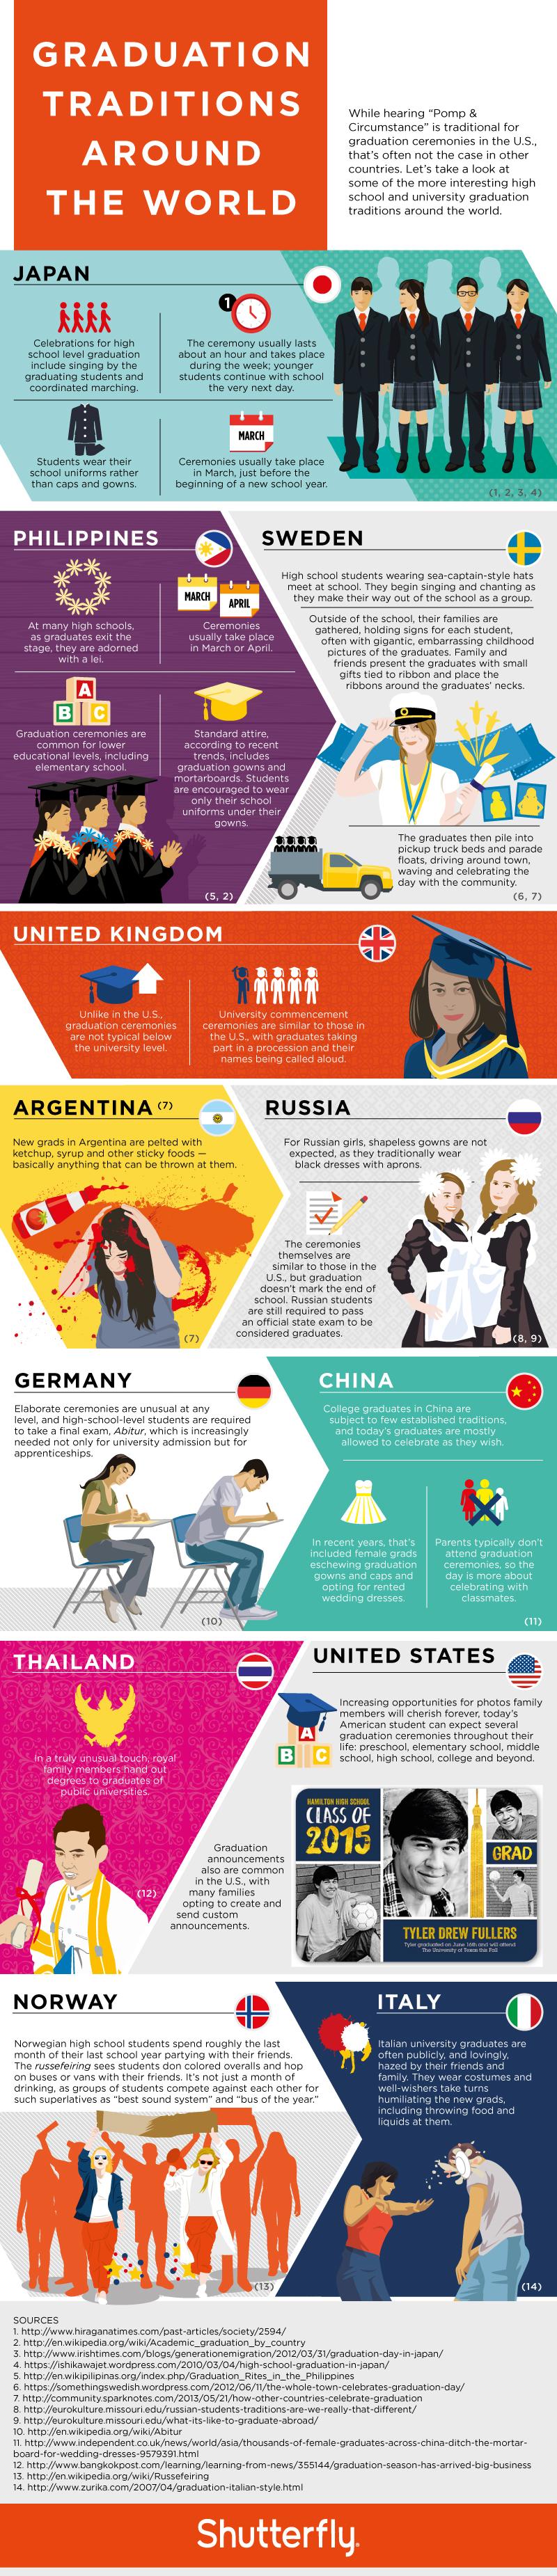 Graduation Traditions Around The World